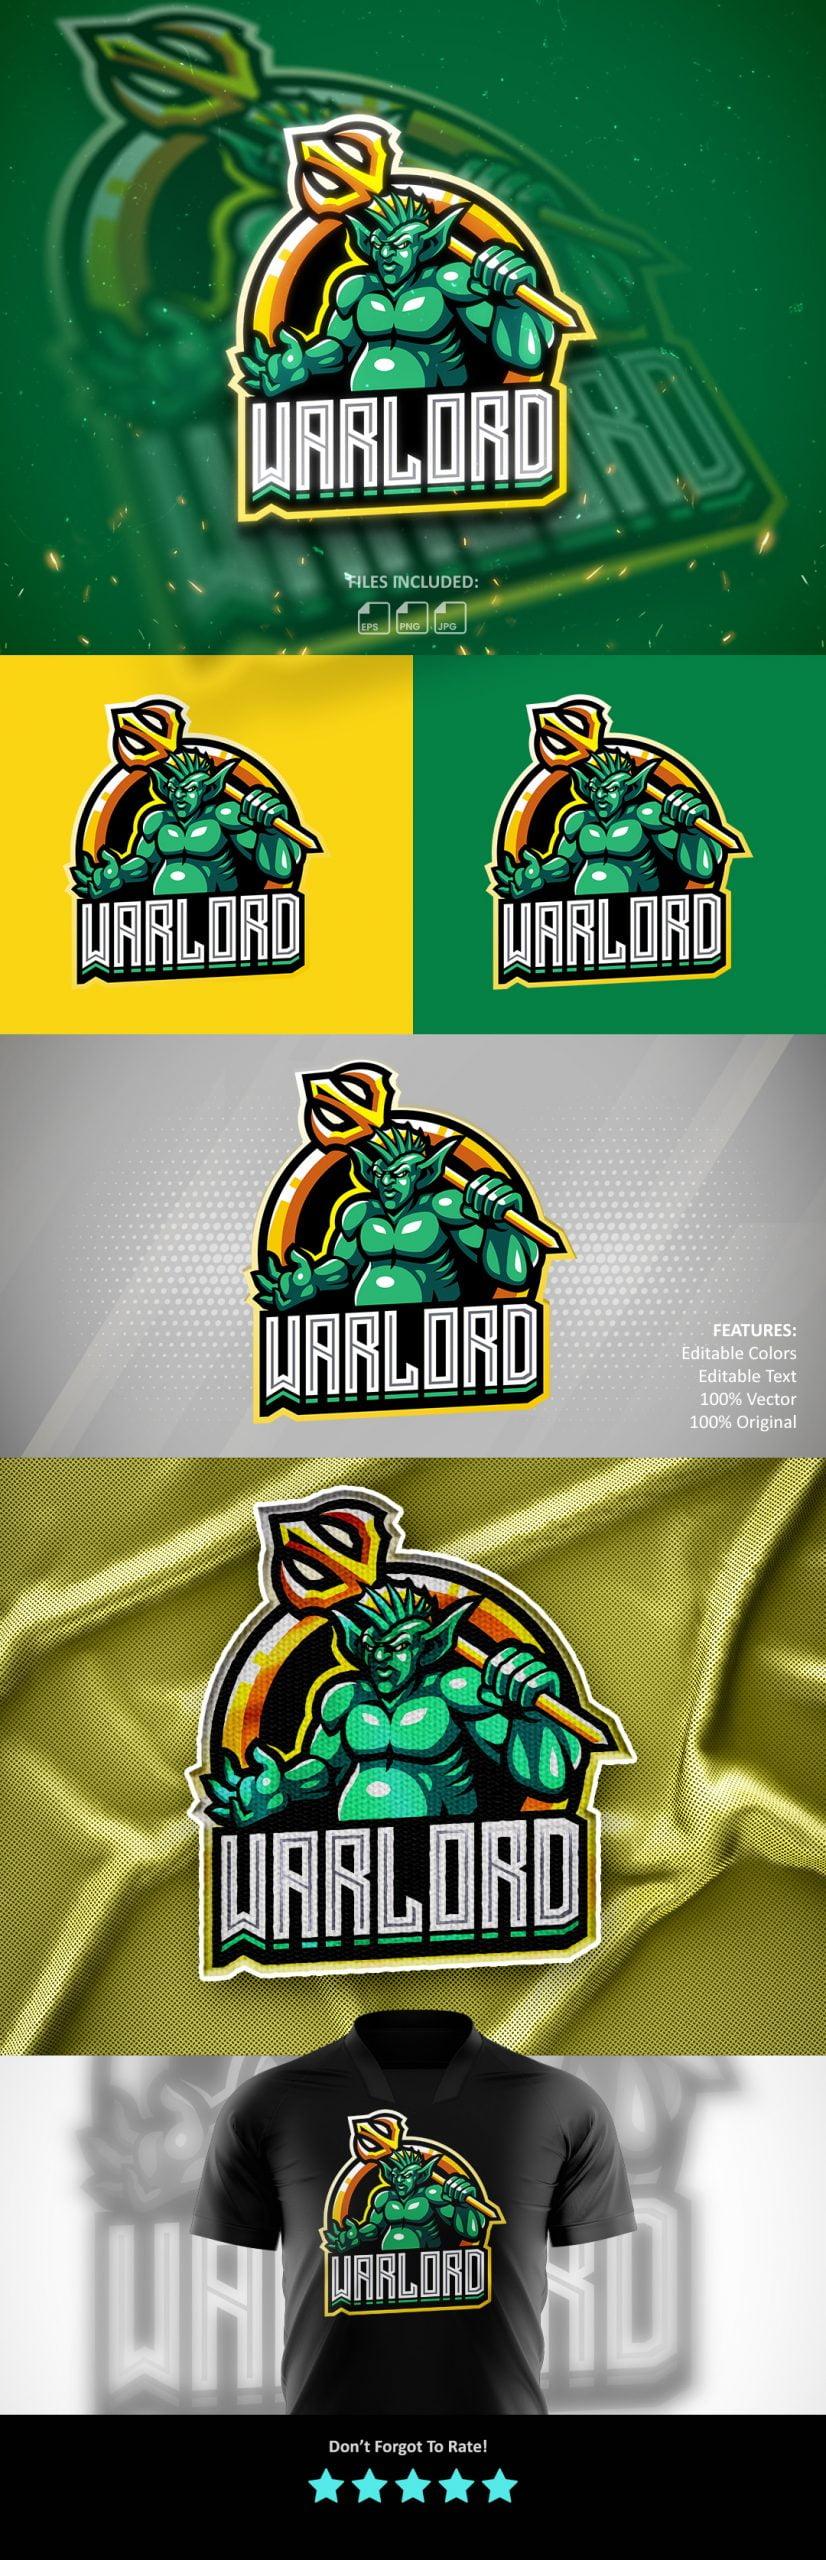 War Lord Esports Mascot Logo Template